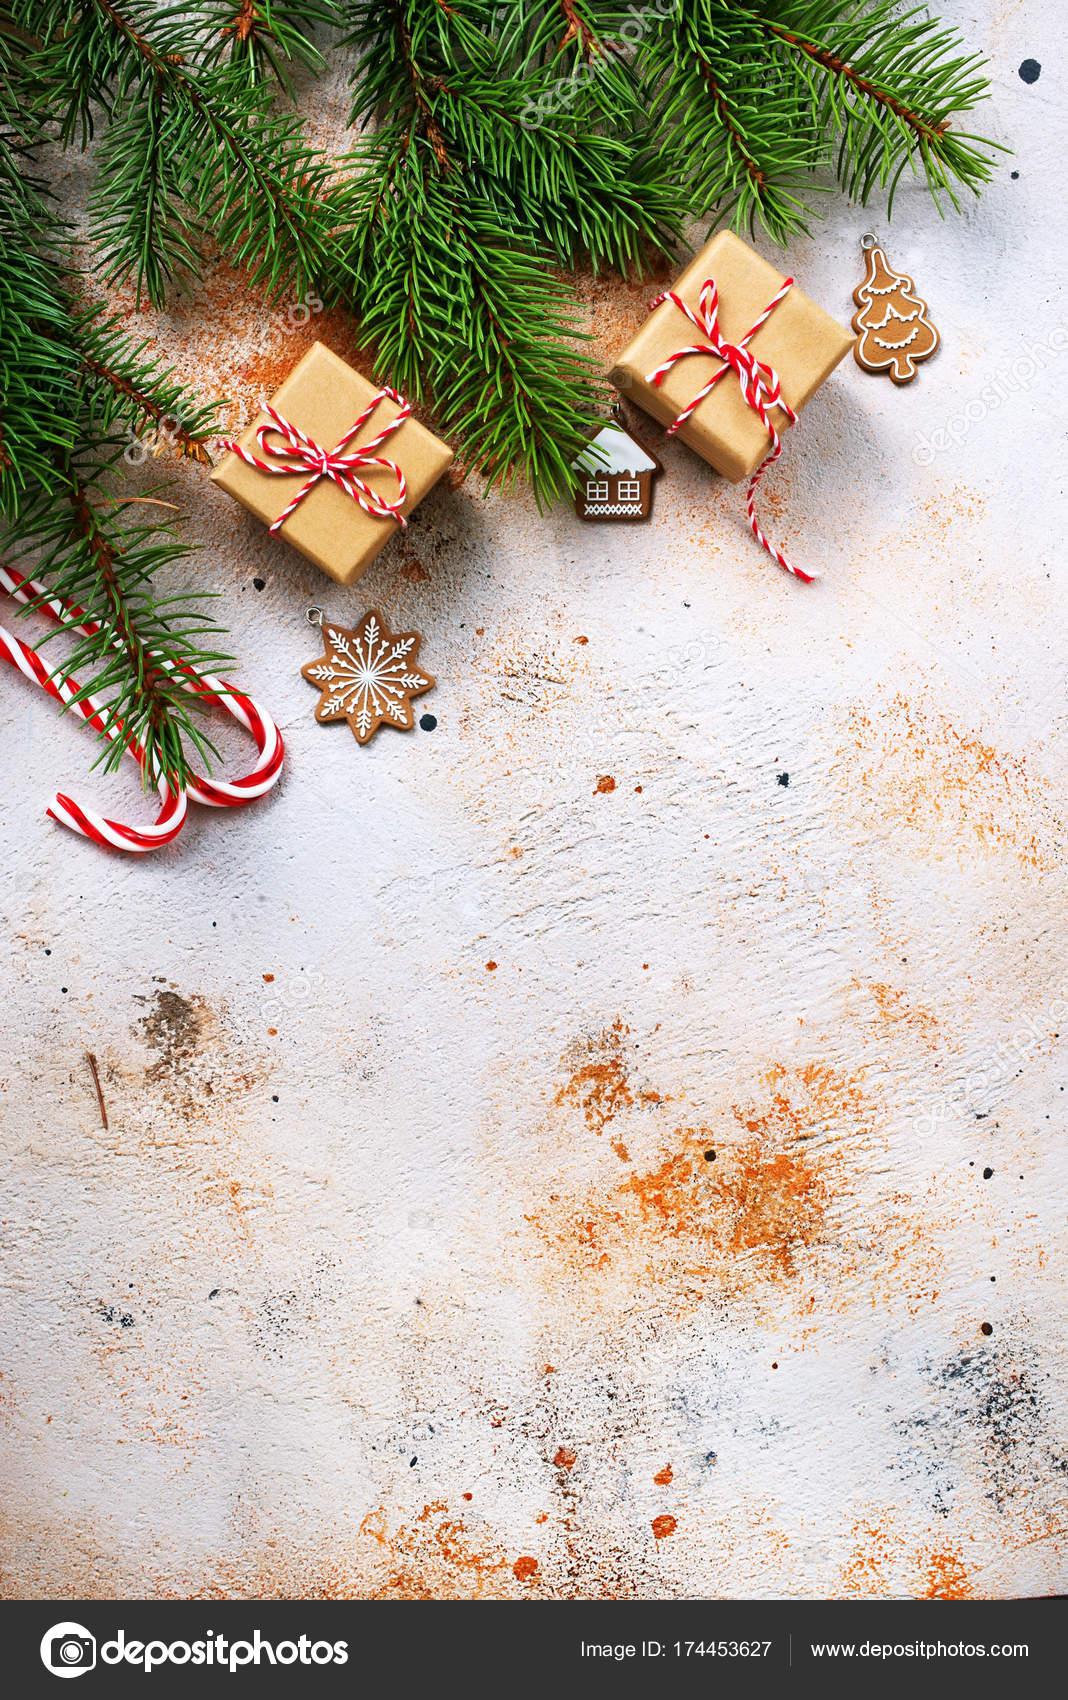 Beautiful Christmas Background Images.Beautiful Christmas Background Stock Photo C Tycoon 174453627